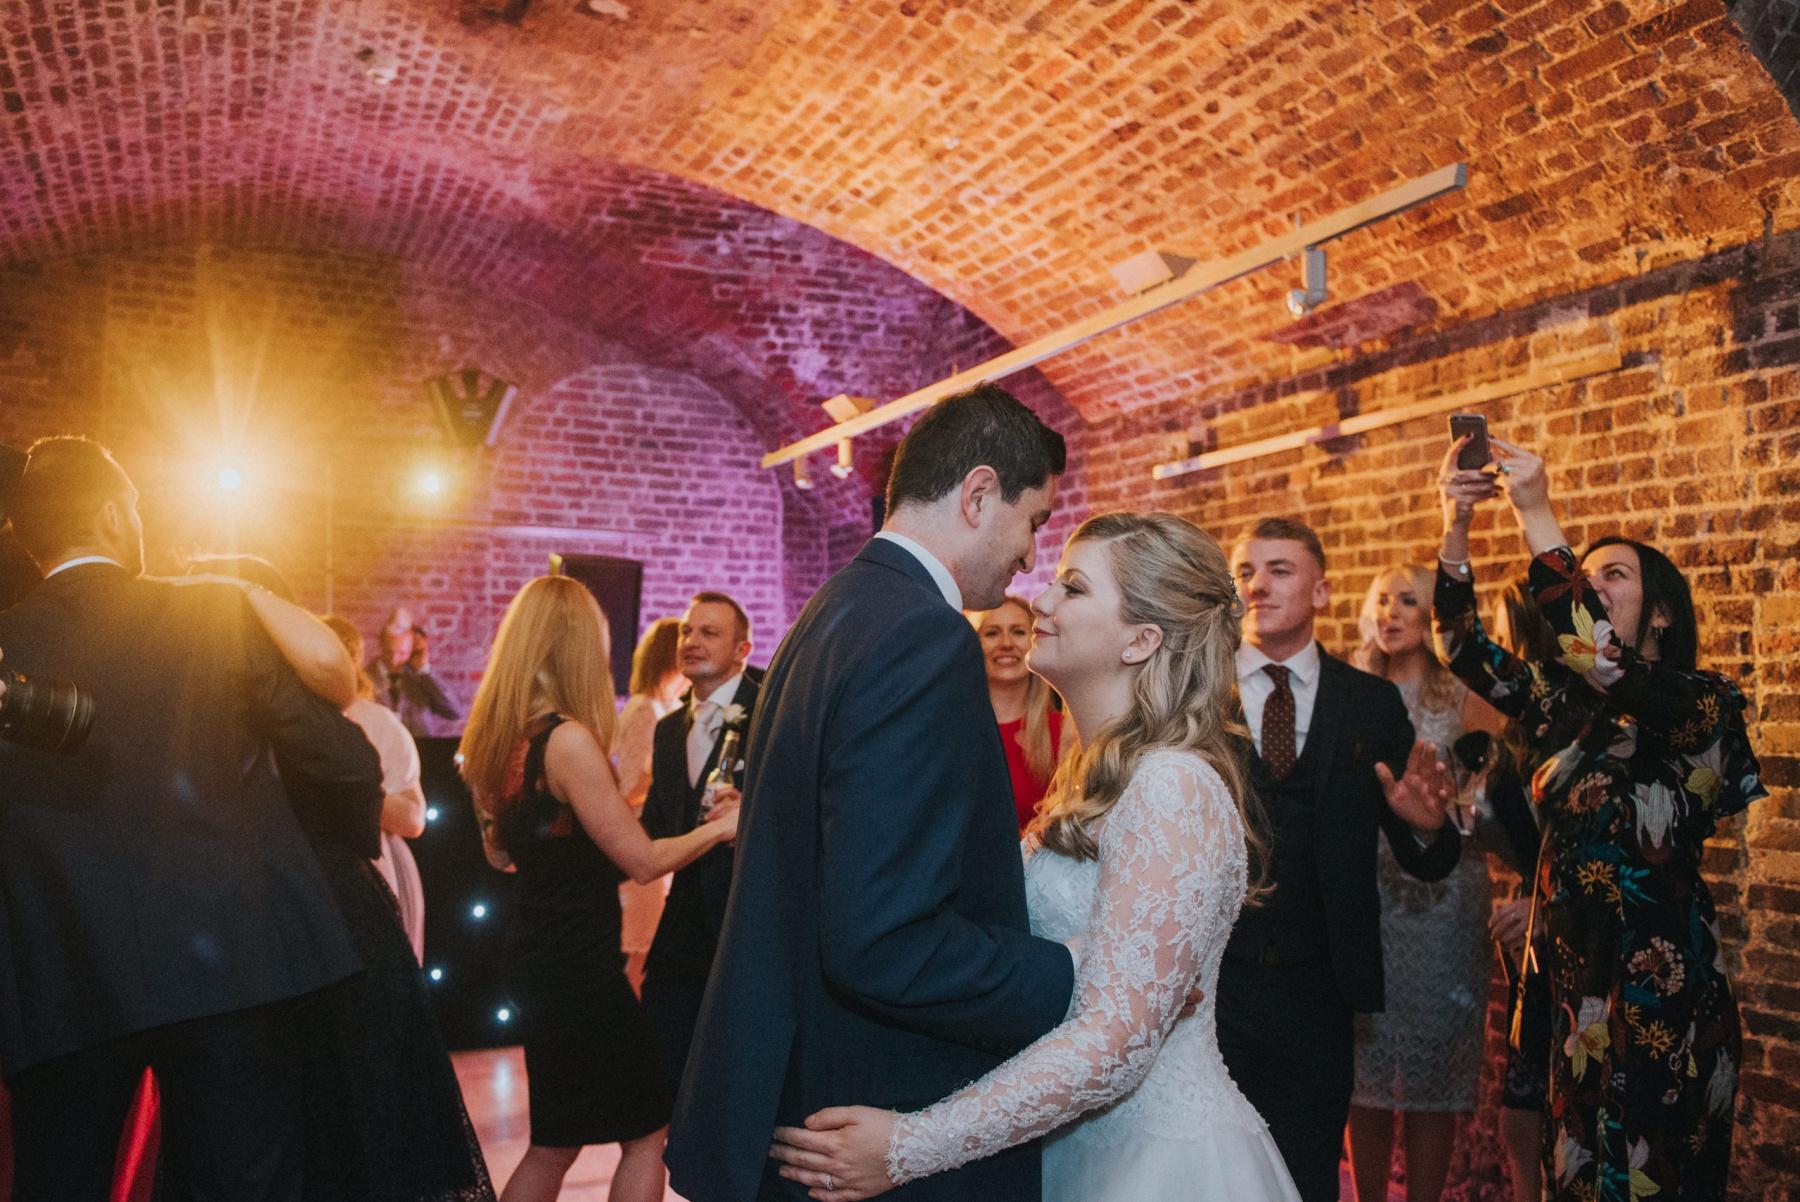 Reportage wedding photos london